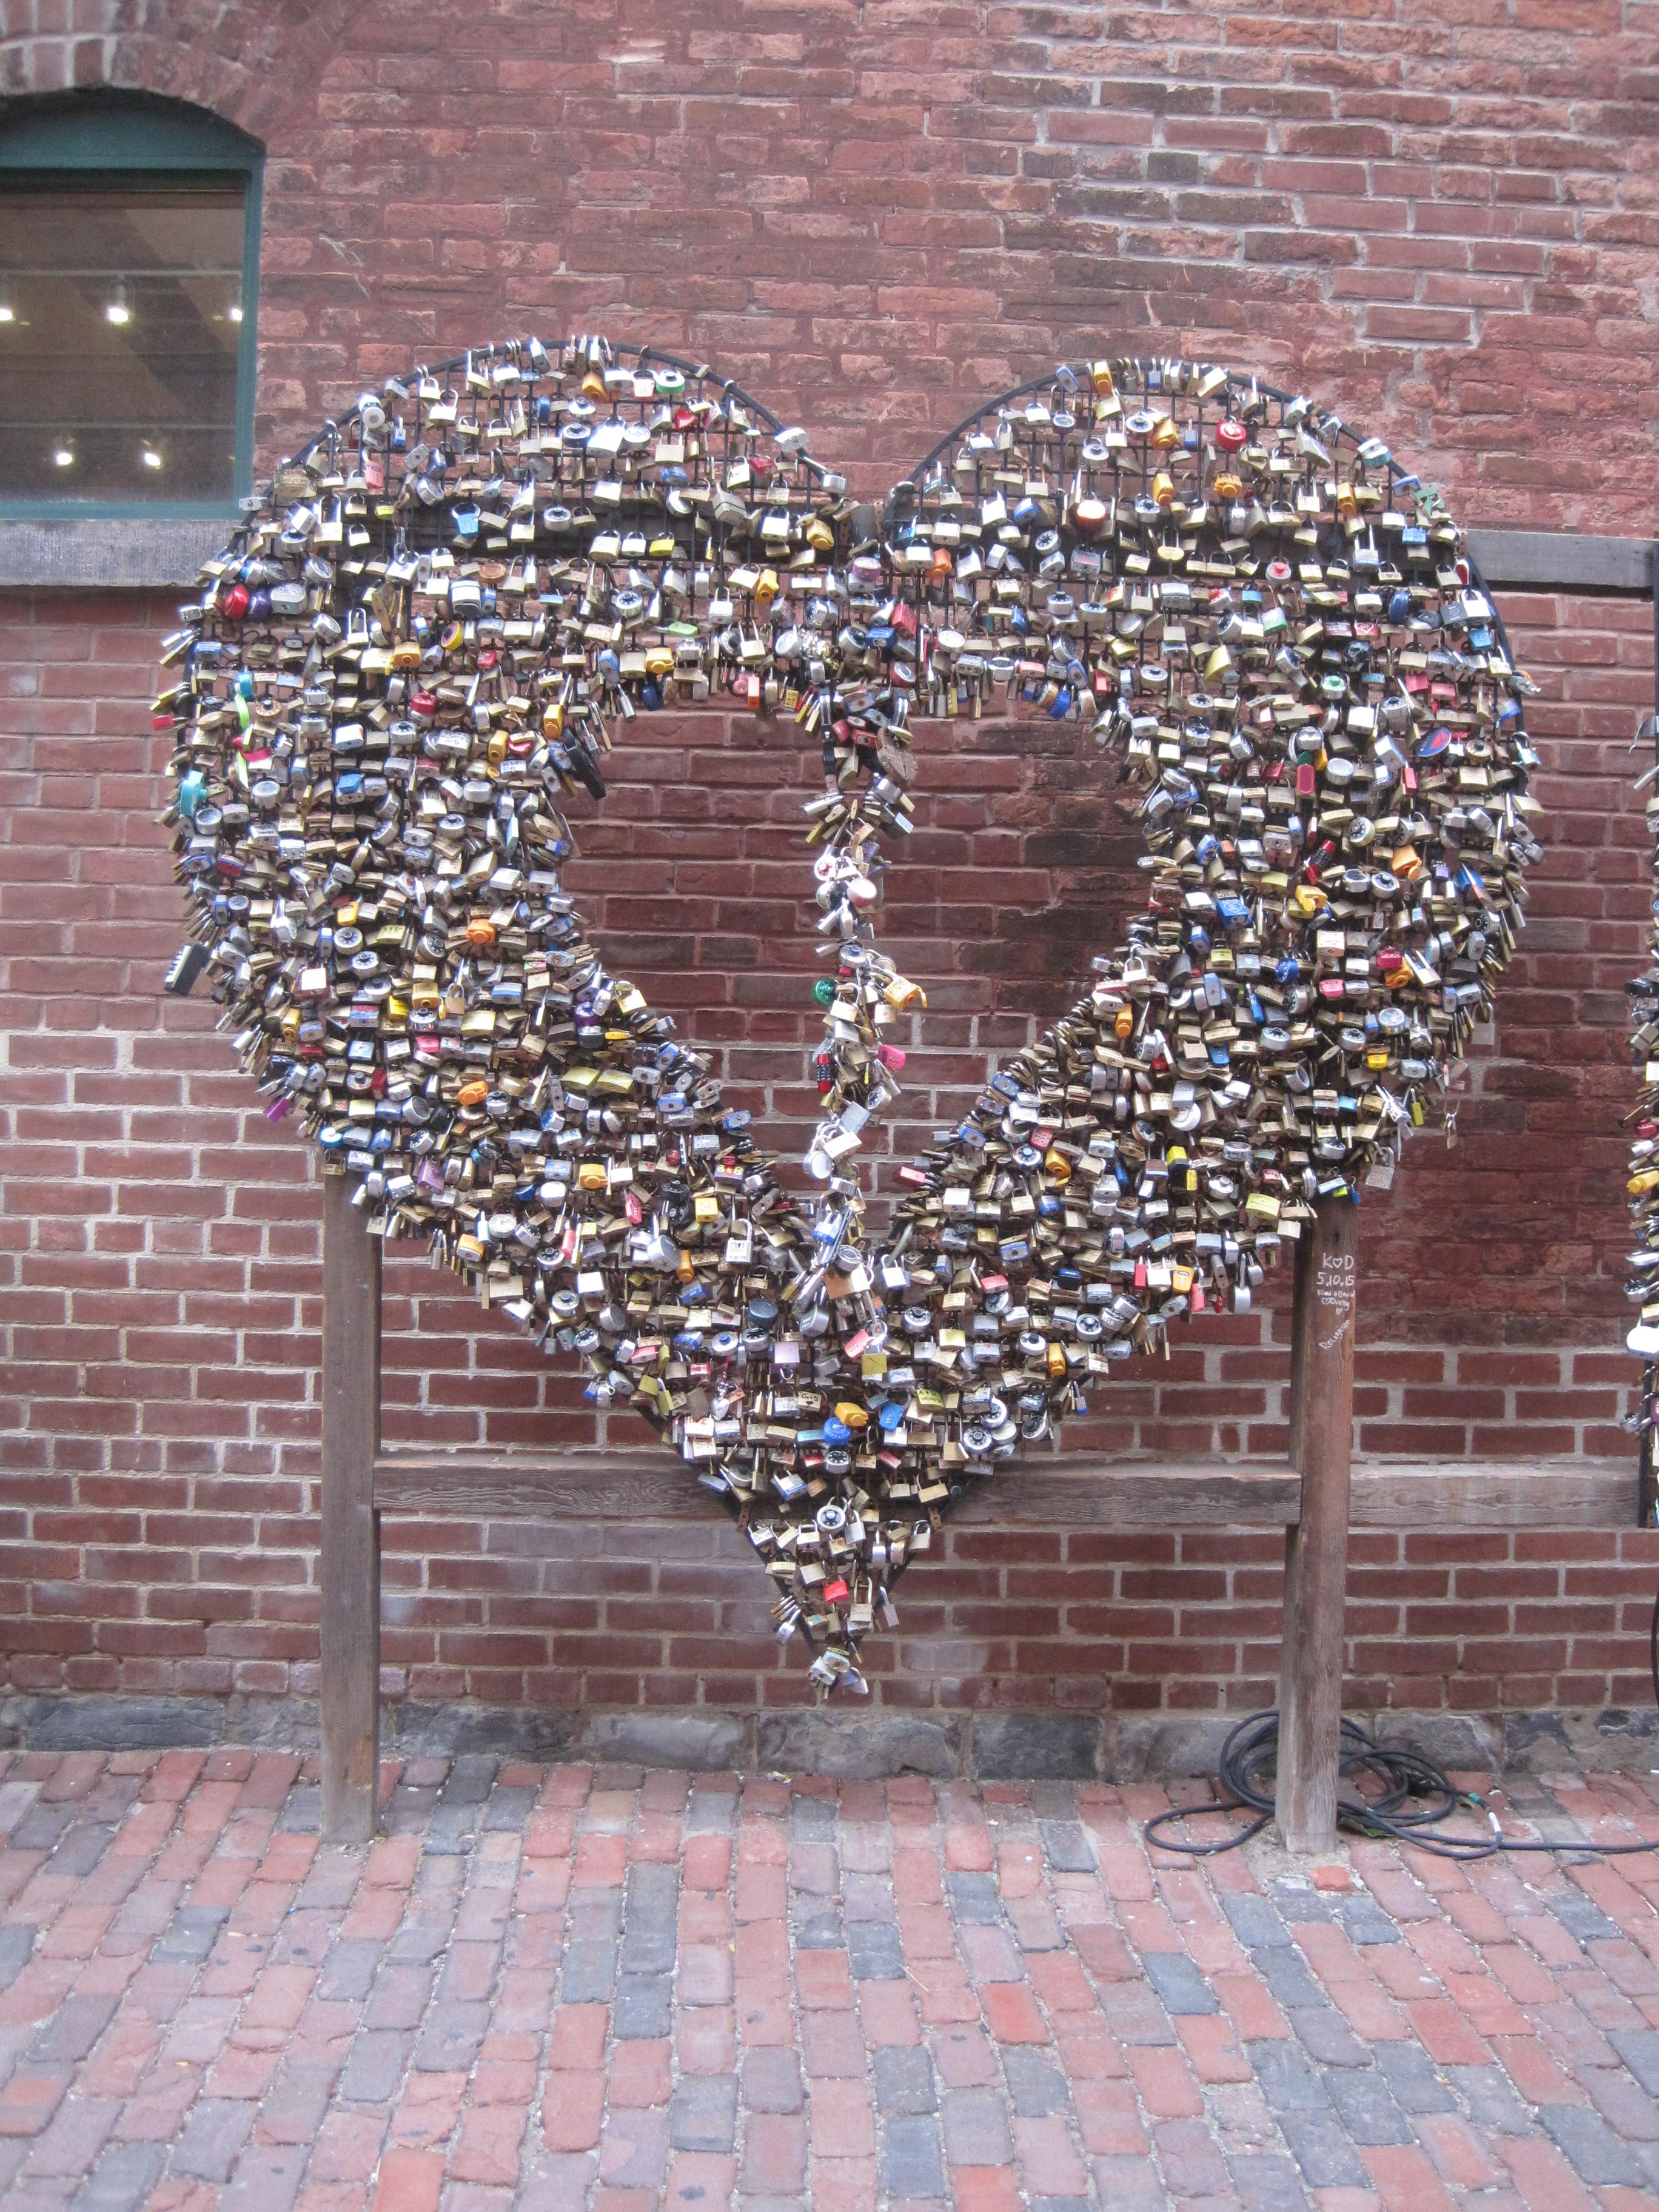 Heart of locks by Juliamaud